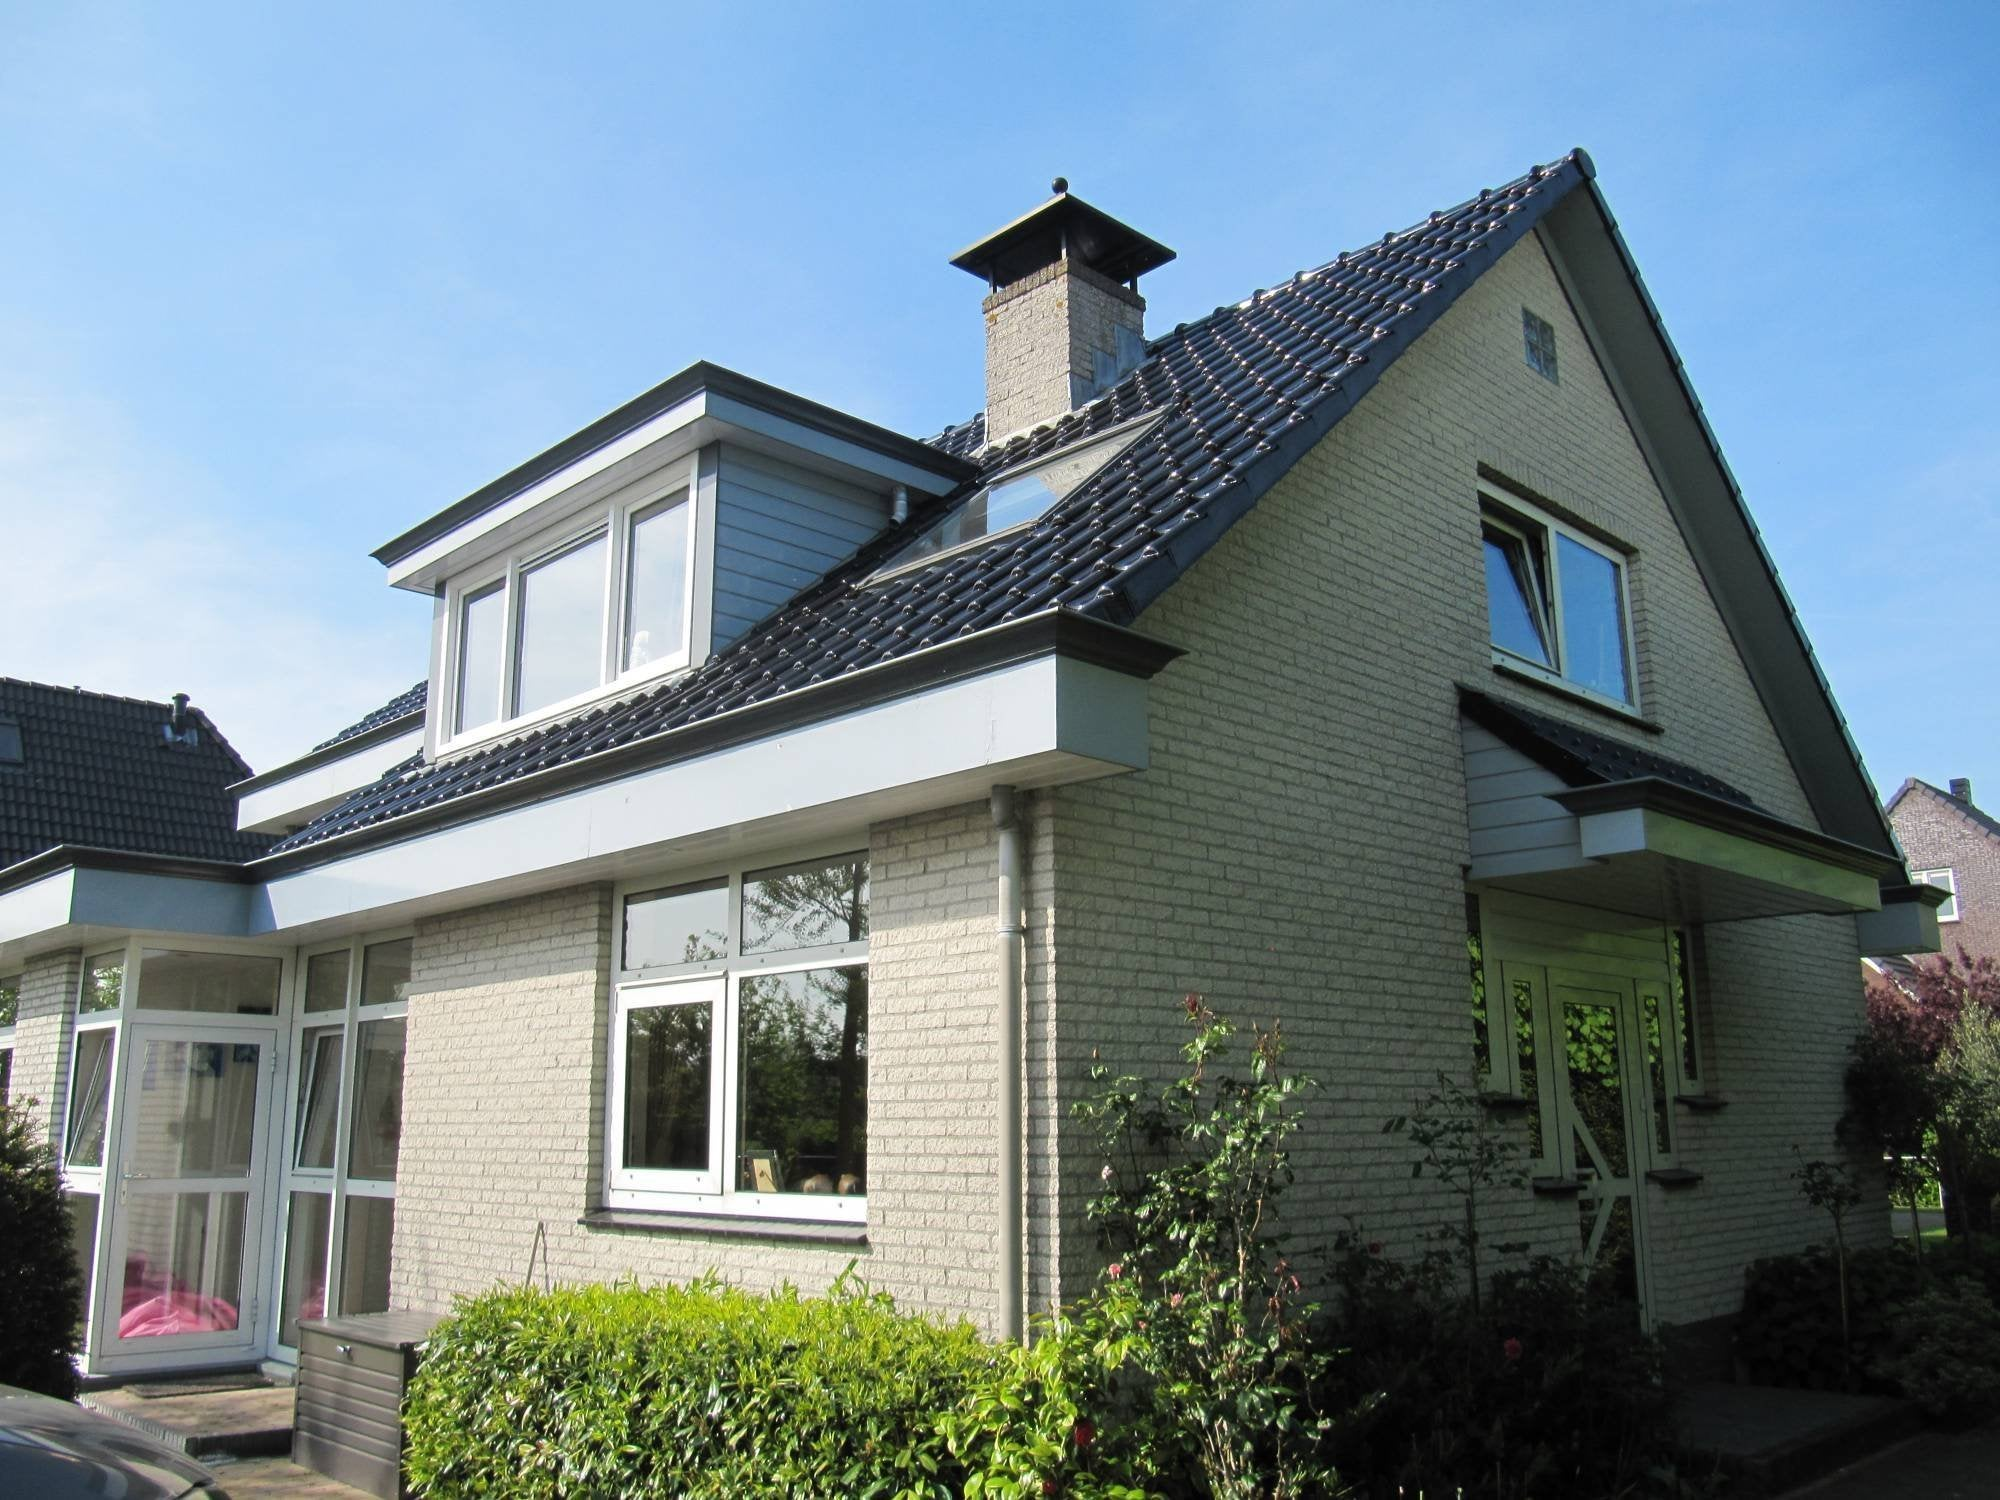 https://public.parariusoffice.nl/15/photos/huge/2481043.1399384586-293.JPG